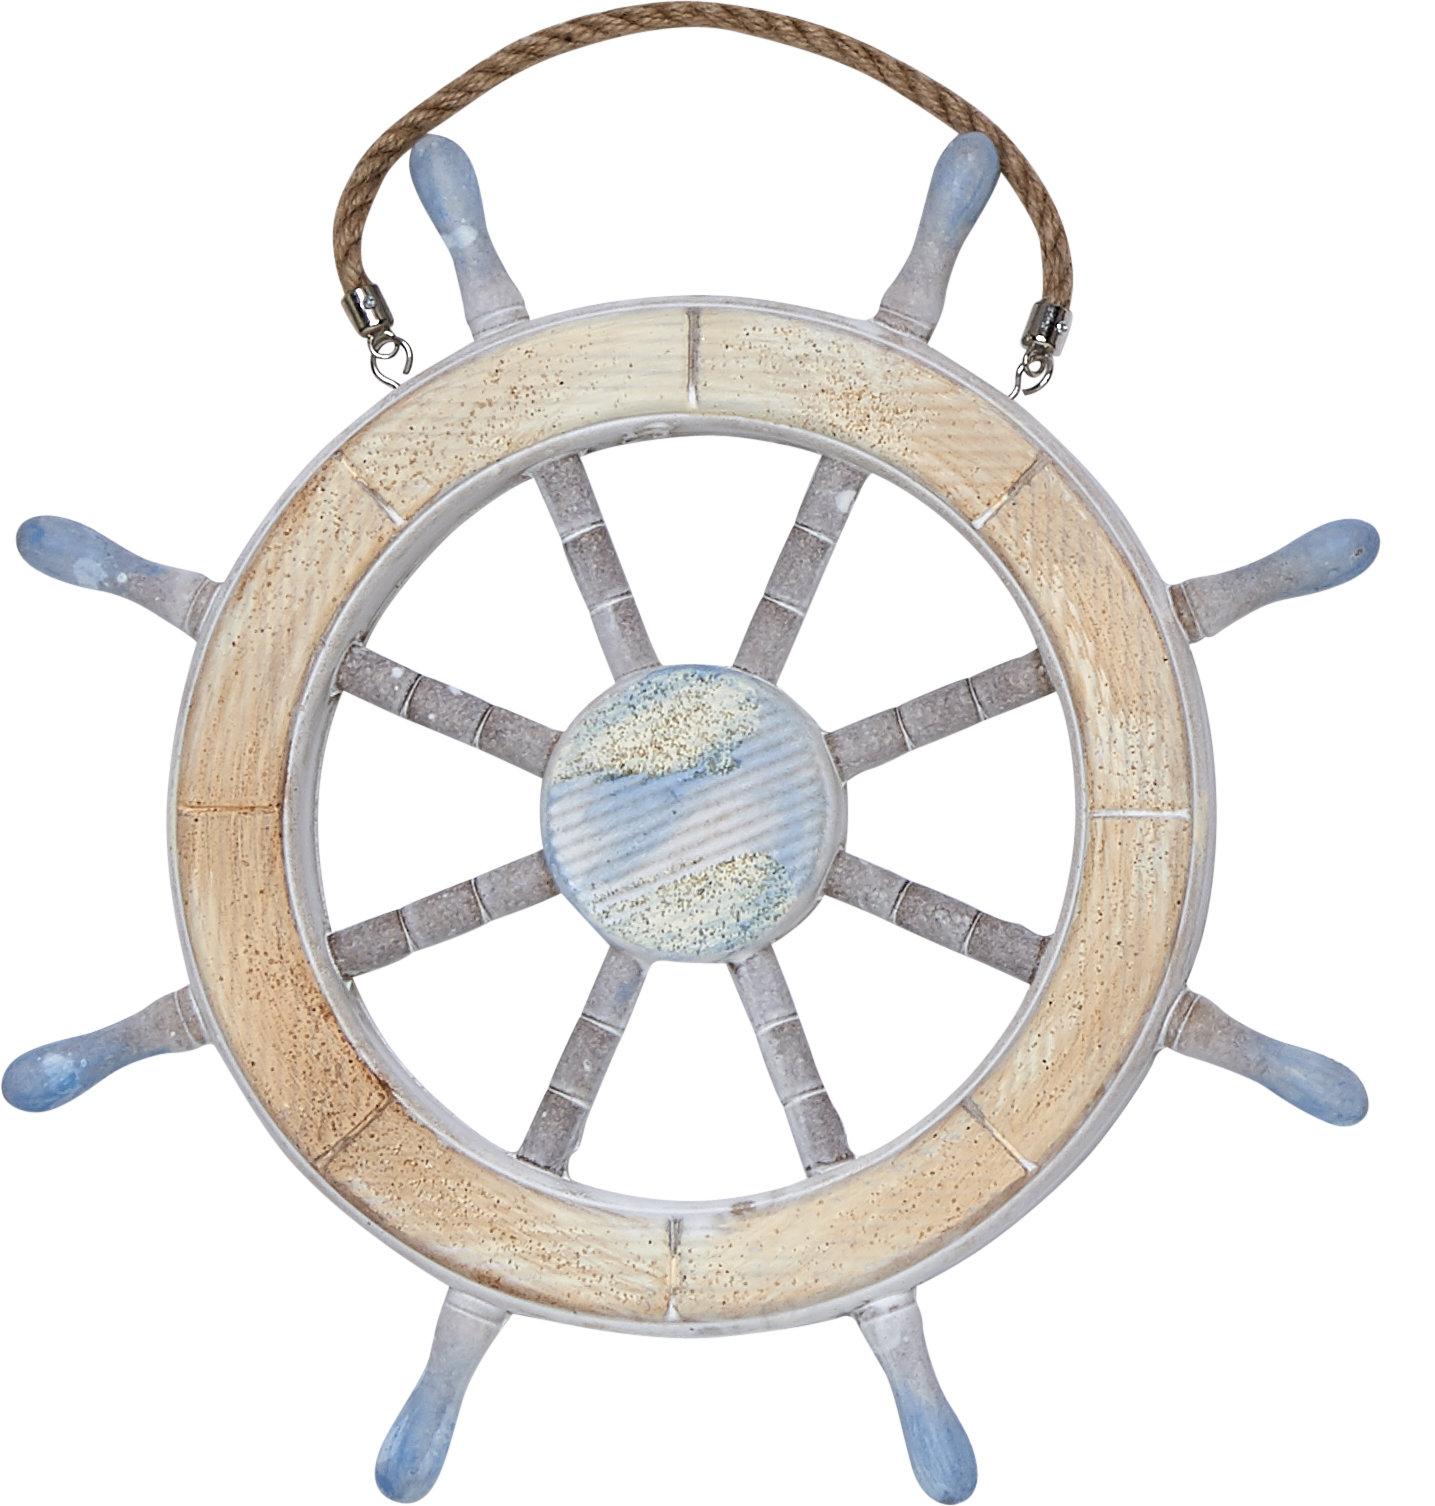 Captains Wheel Wall Decor | Wayfair with regard to 4 Piece Handwoven Wheel Wall Decor Sets (Image 10 of 30)